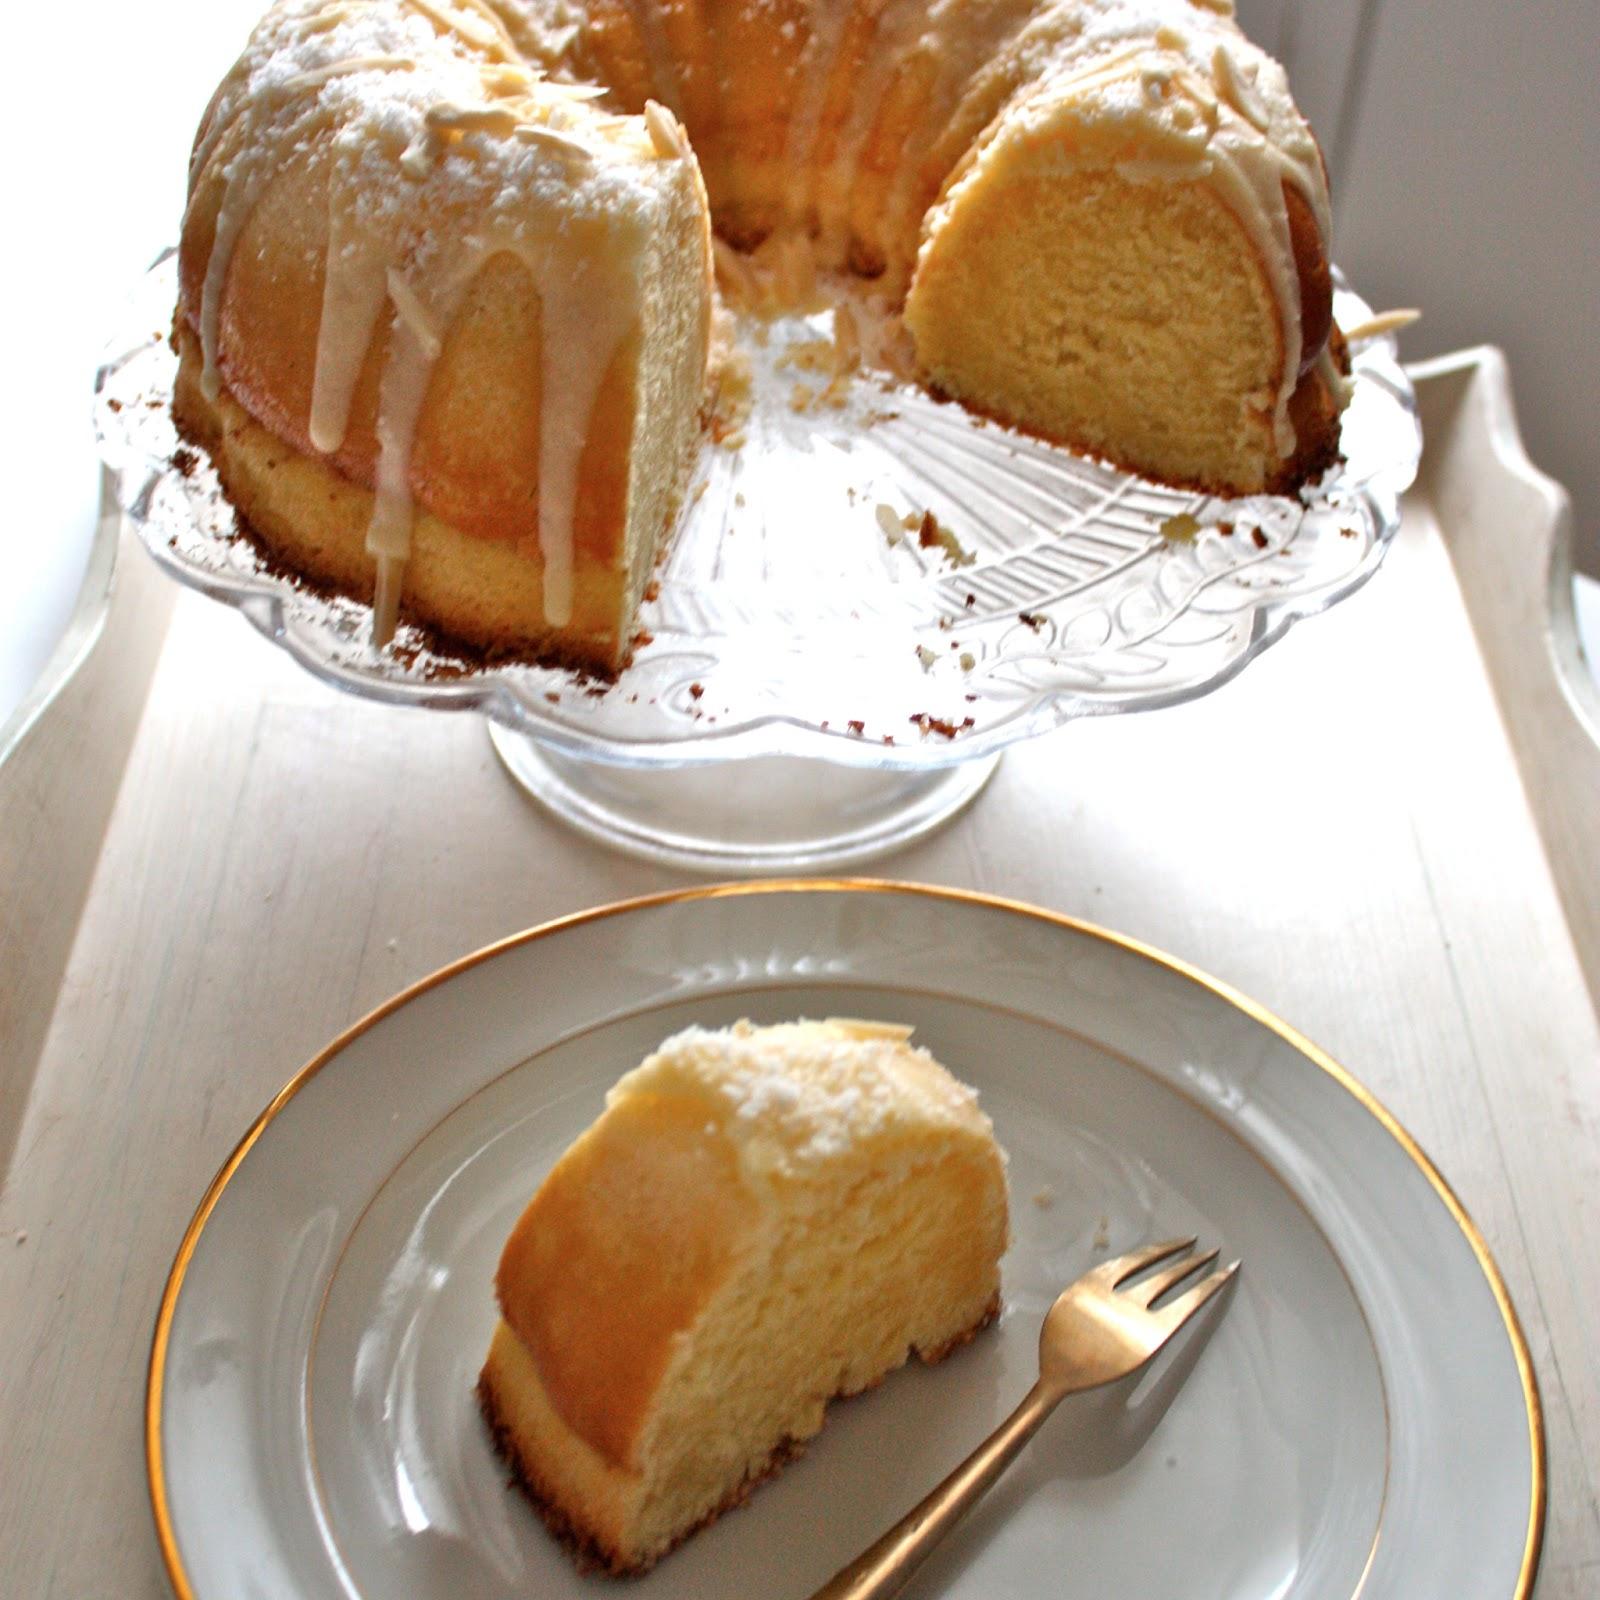 lion's nest: Louisiana Crunch Cake